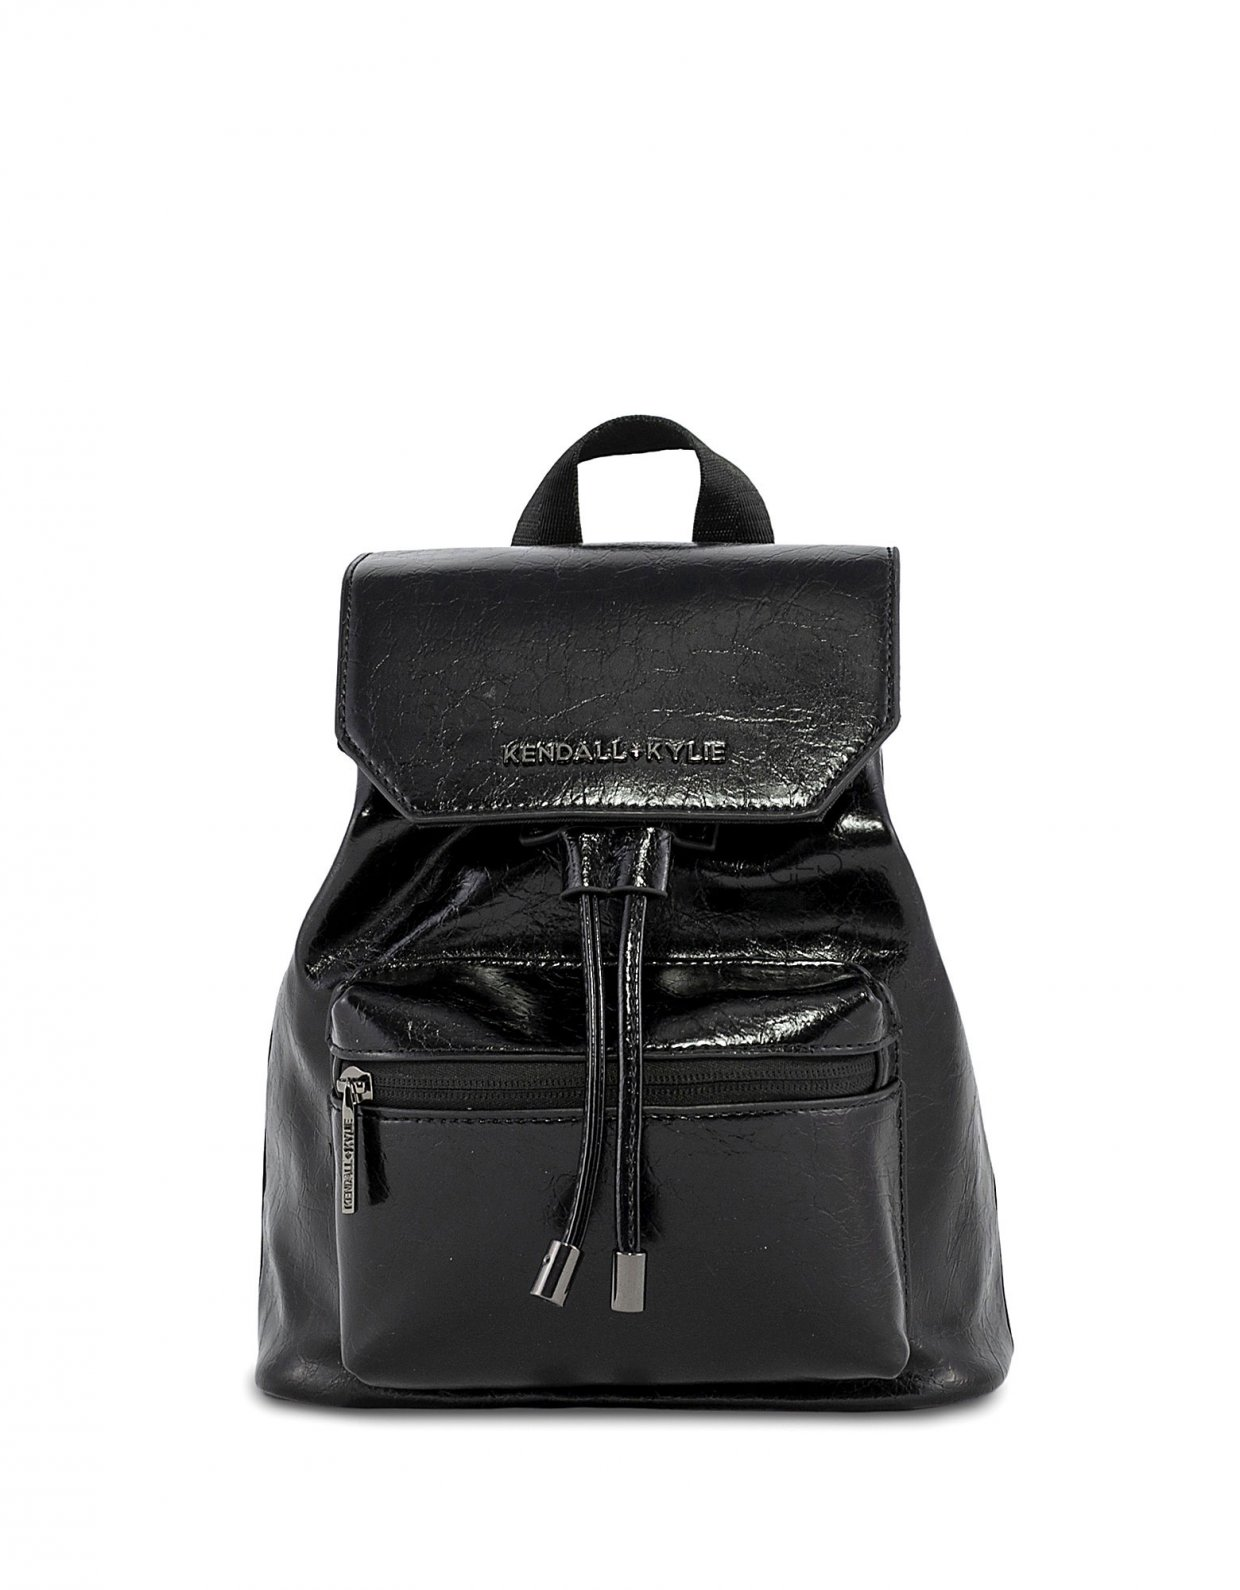 Kendall + Kylie Serena small backpack crinkled black